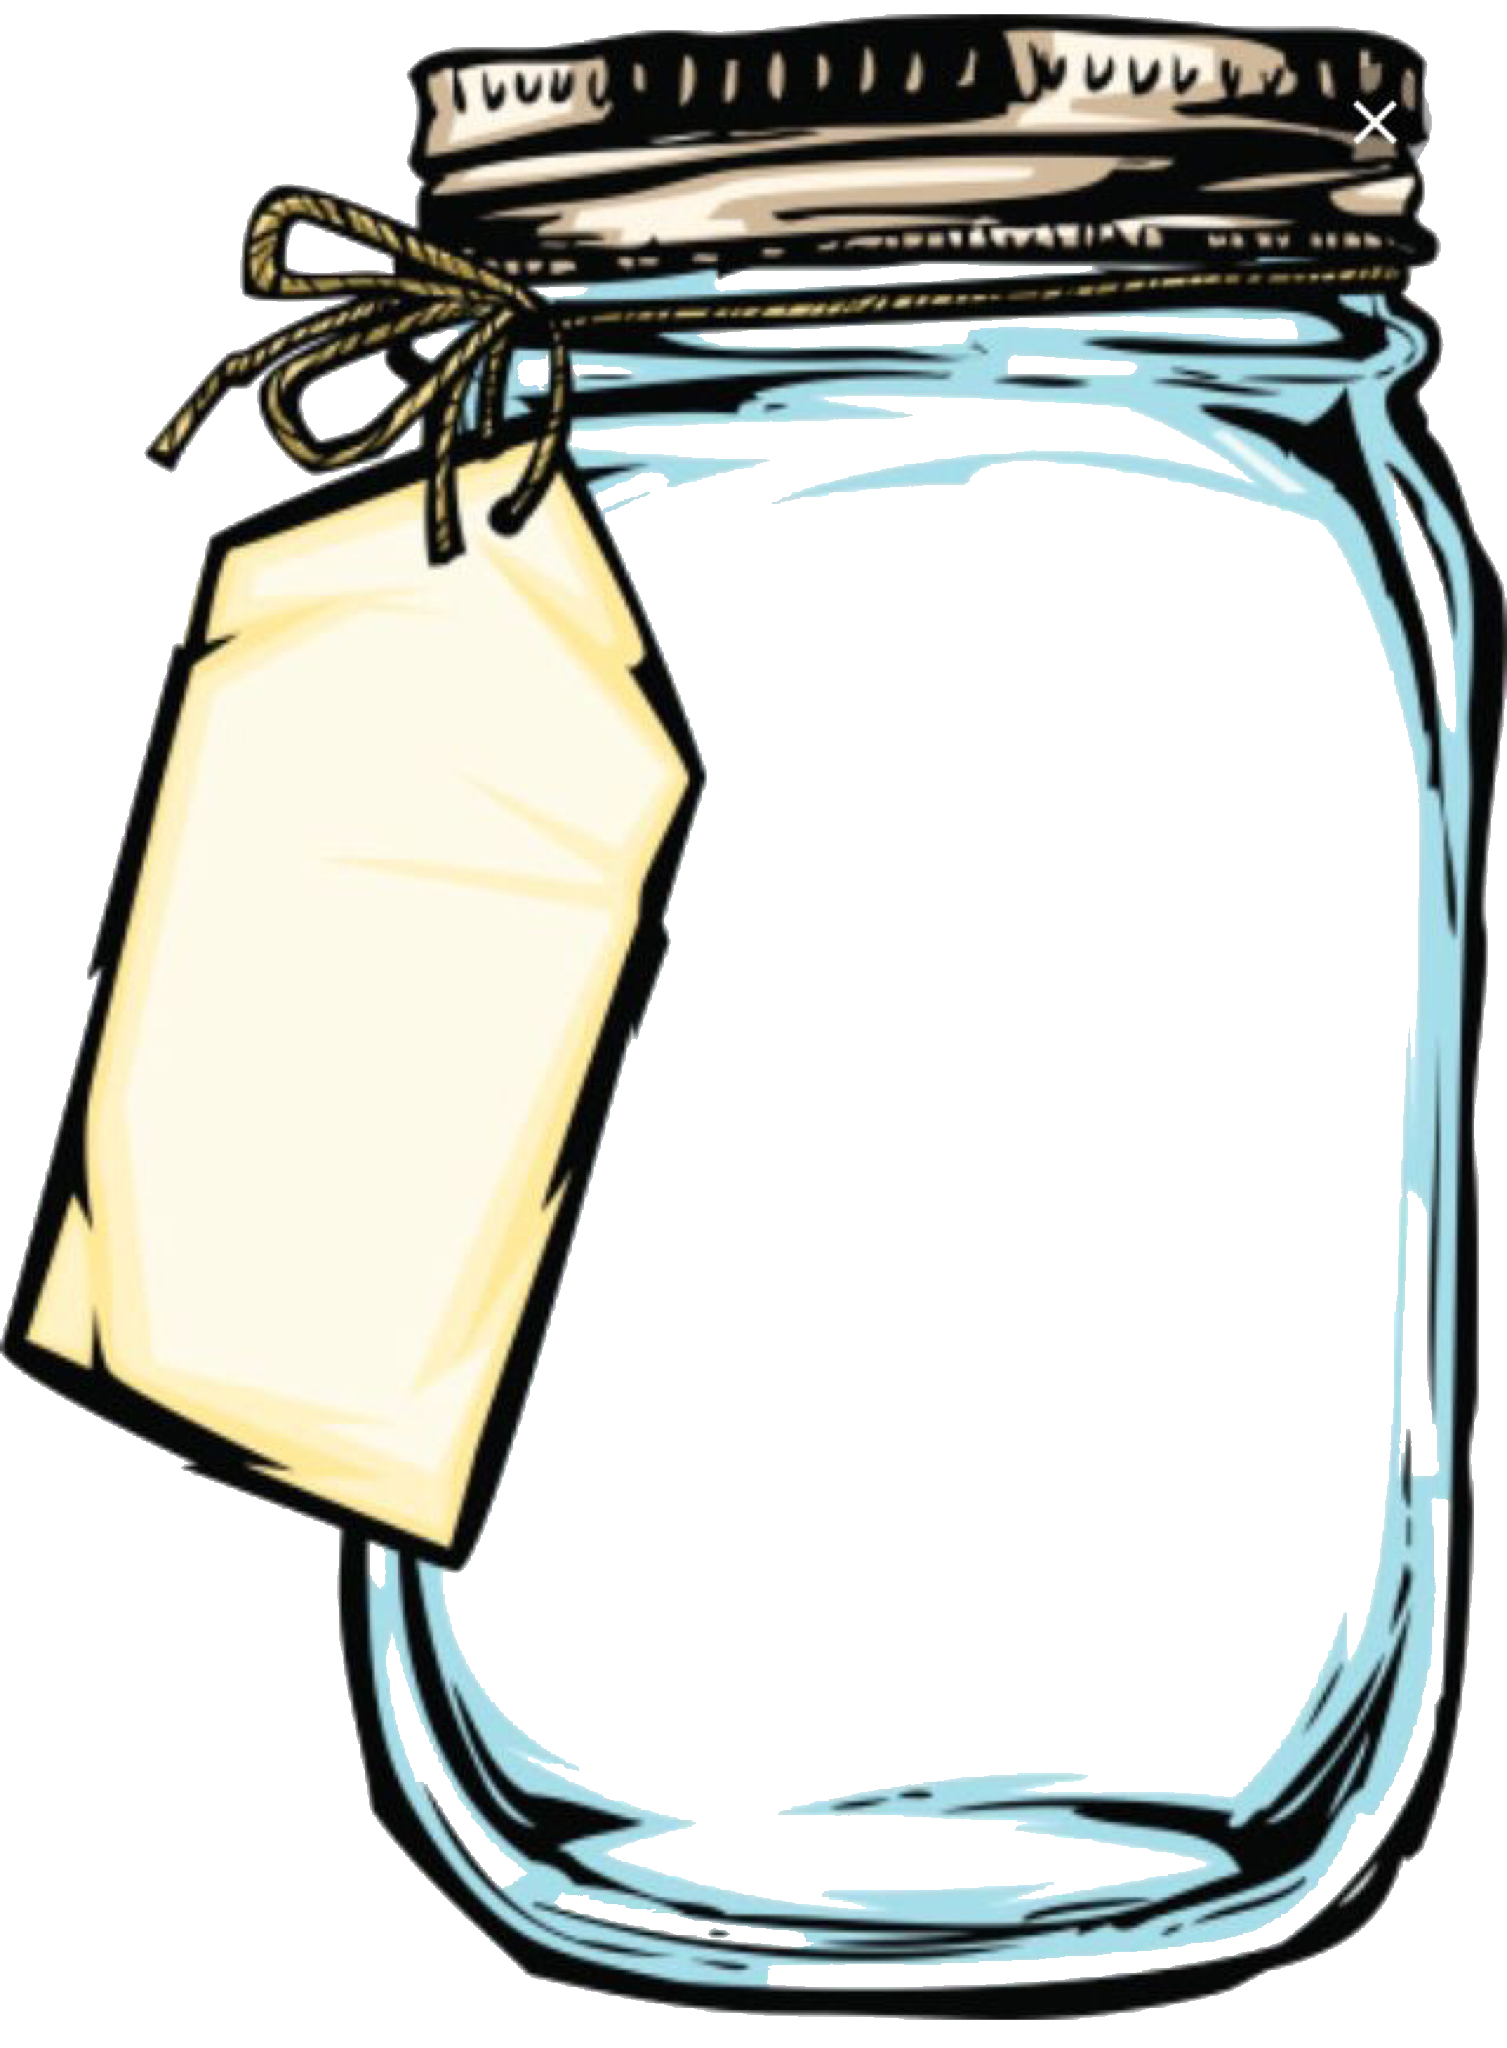 Free mason jar clipart png library download Pin by April Honeycutt on print | Mason jar clip art, Mason jar ... png library download